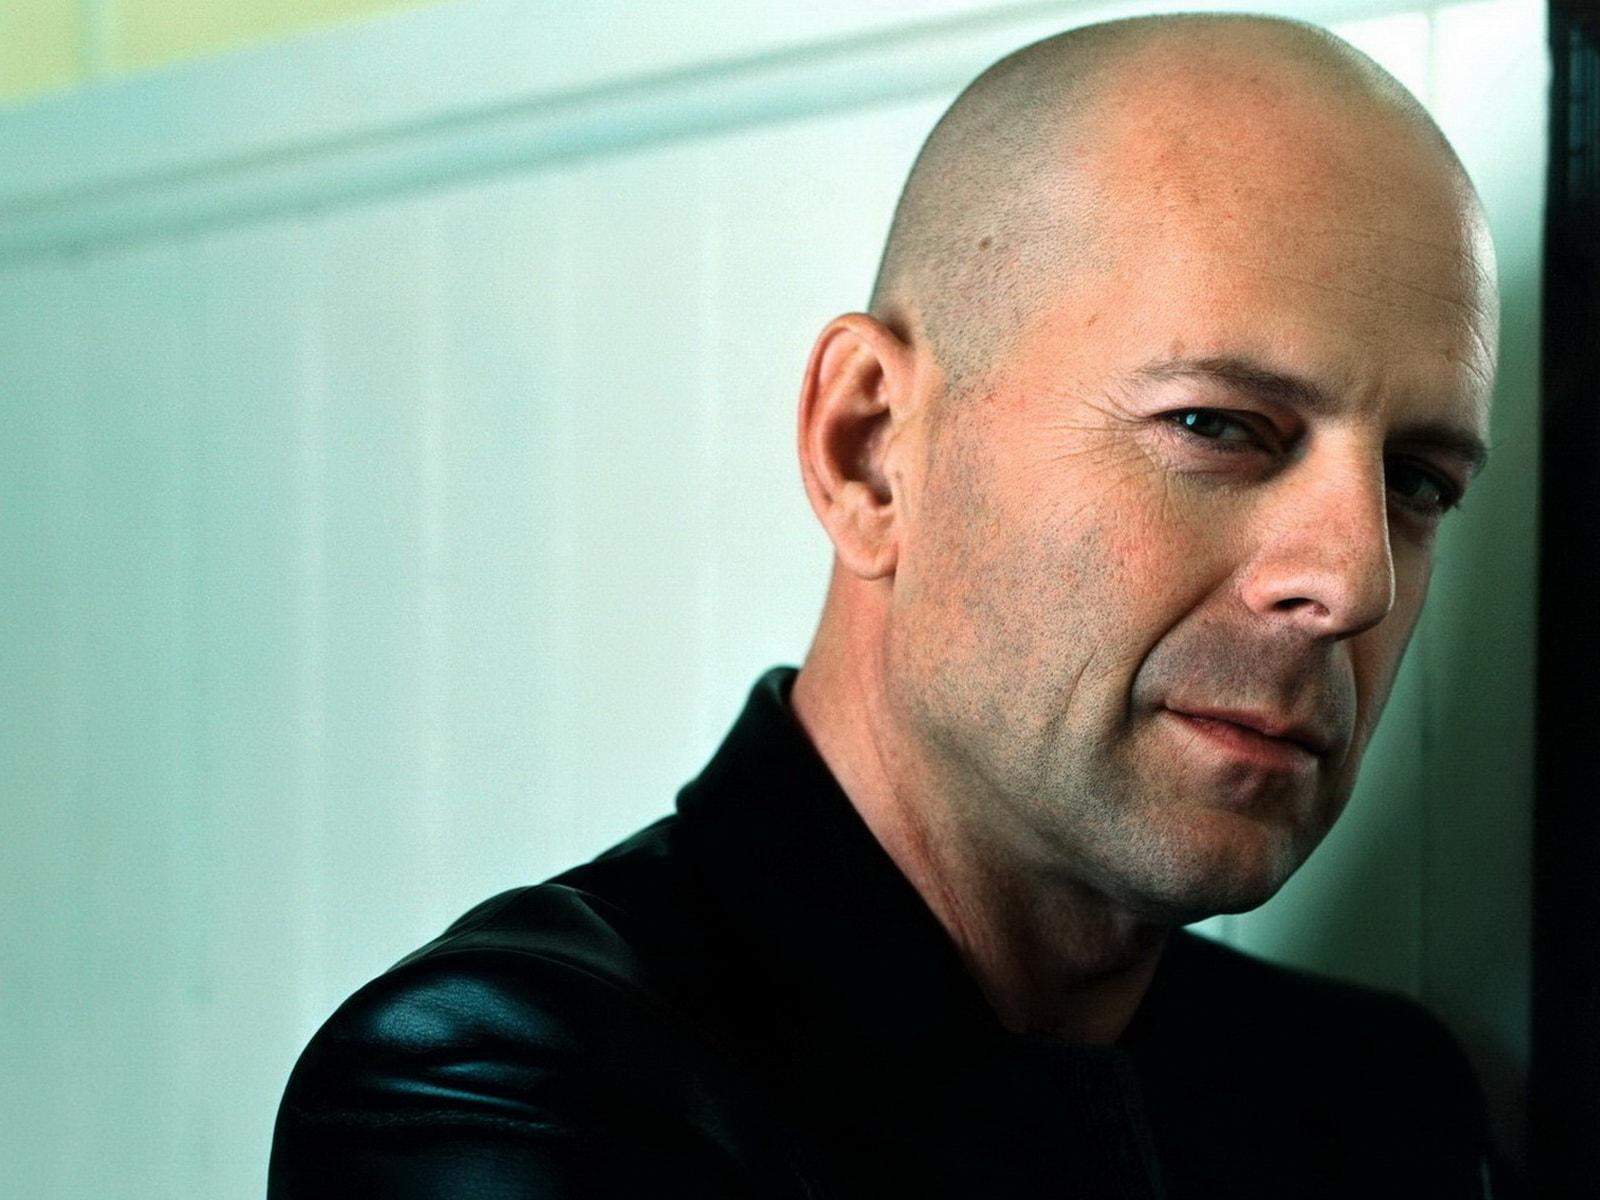 Bruce Willis Background